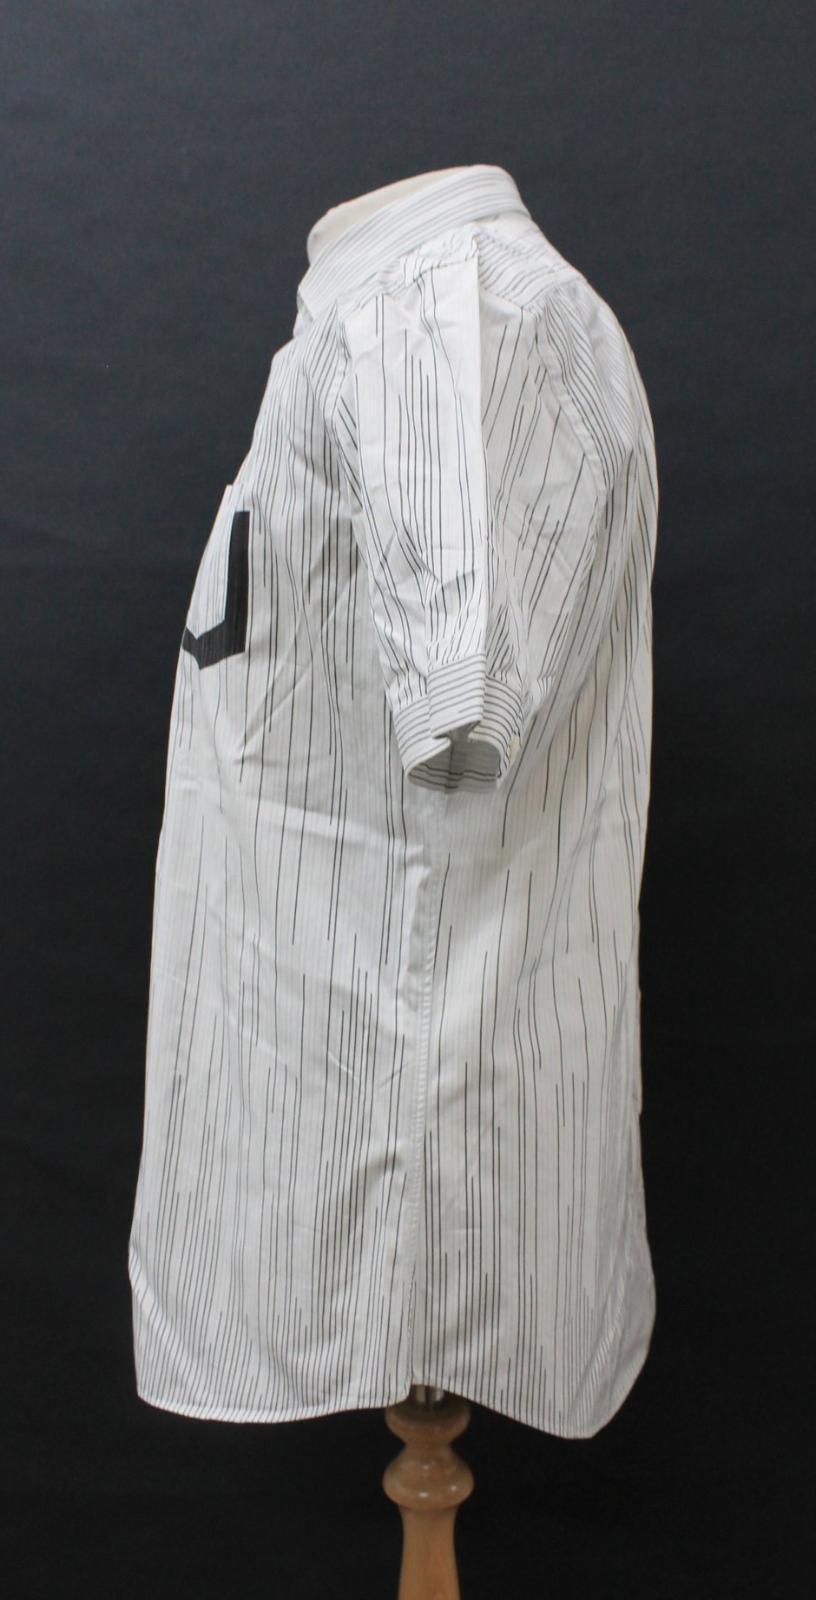 Neil-Barrett-Hombre-Blanco-Algodon-De-Rayas-Camisa-De-Manga-Corta-Estampado-de-bolsillo-16-5-034 miniatura 7